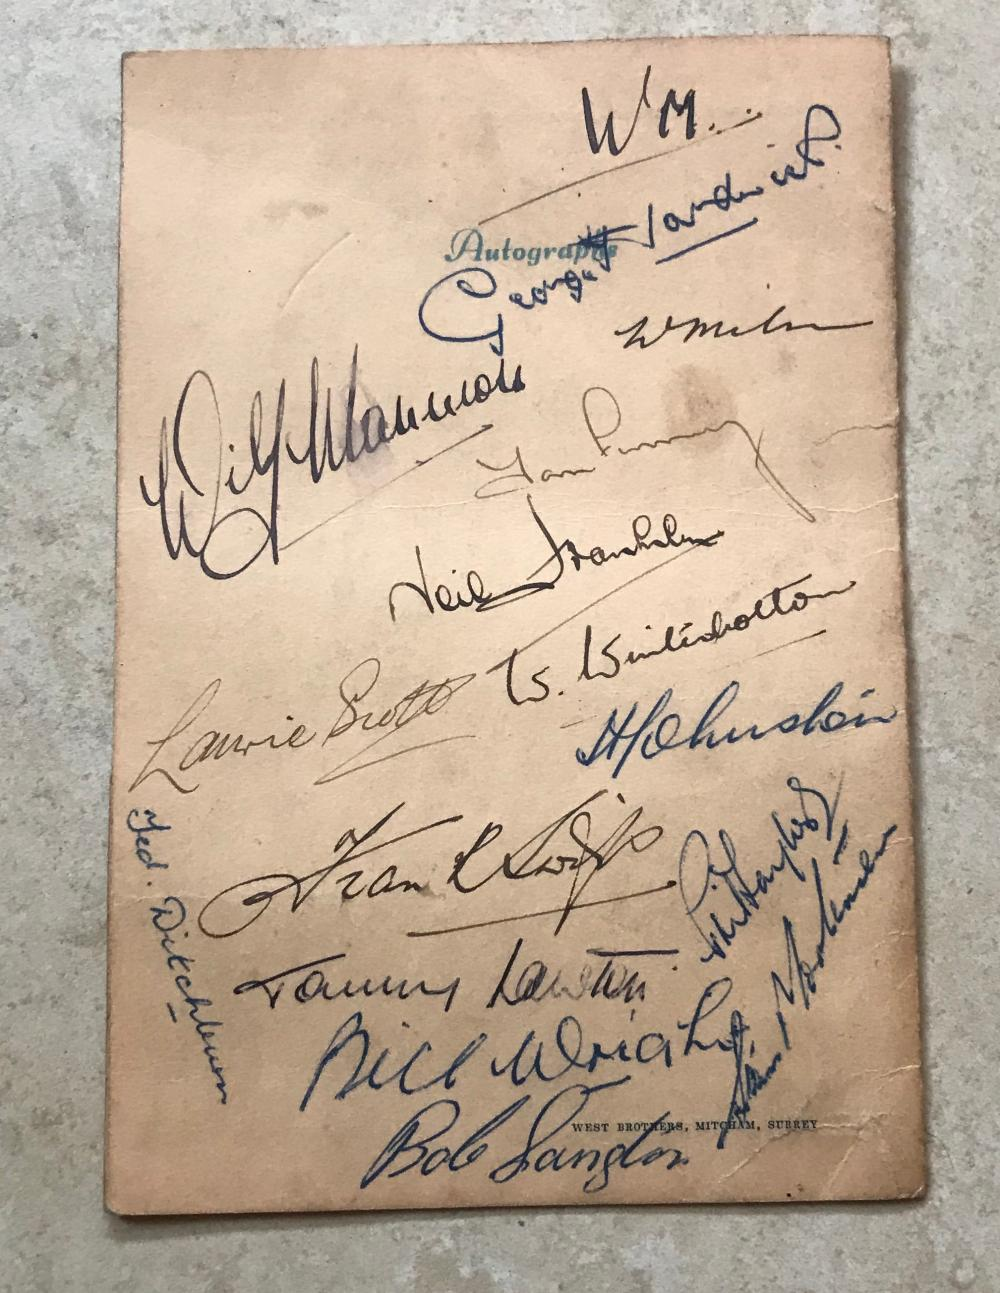 England Football 1947 team signed Menu. 10th October Cafe Royal dinner menu signed by 15 including